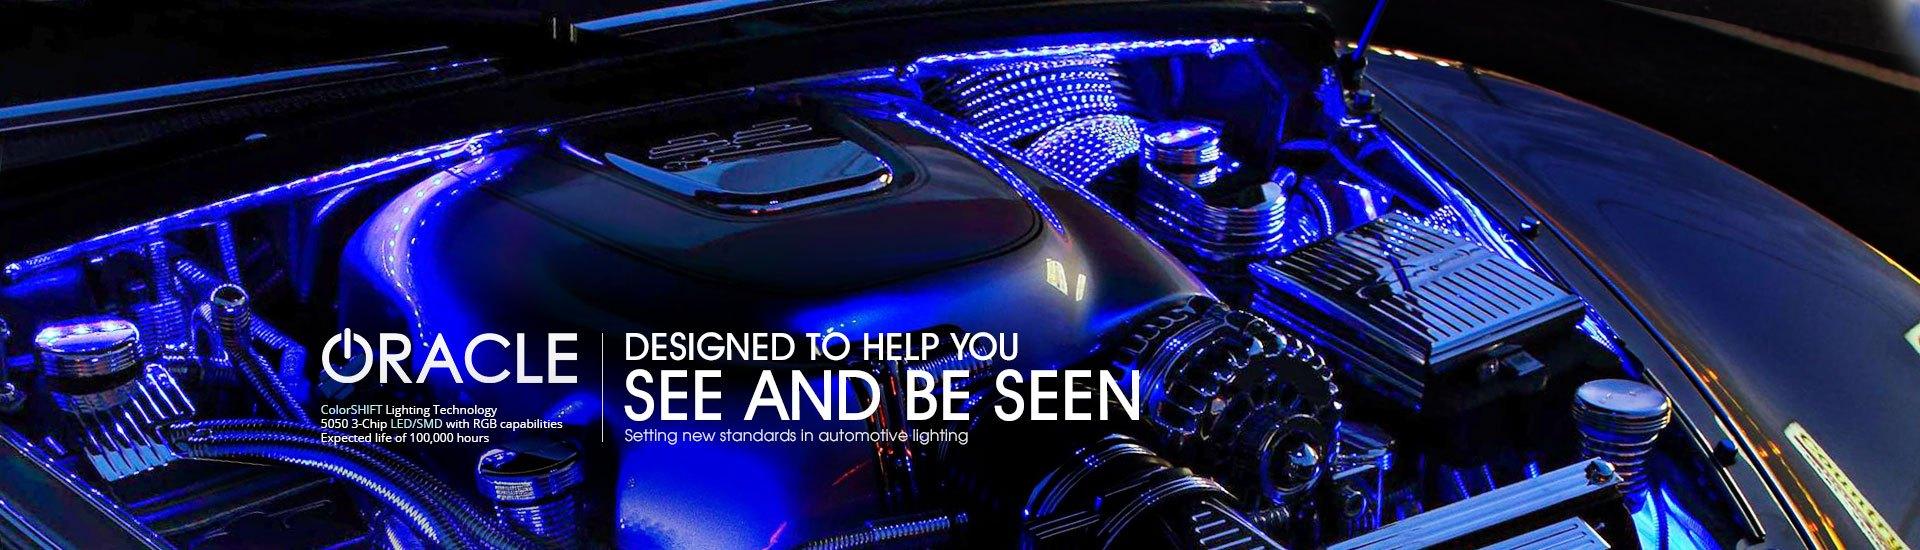 4 u2044 8  sc 1 st  CARiD.com & Automotive LED Lights | Bars Strips Halos Bulbs Custom Light Kits